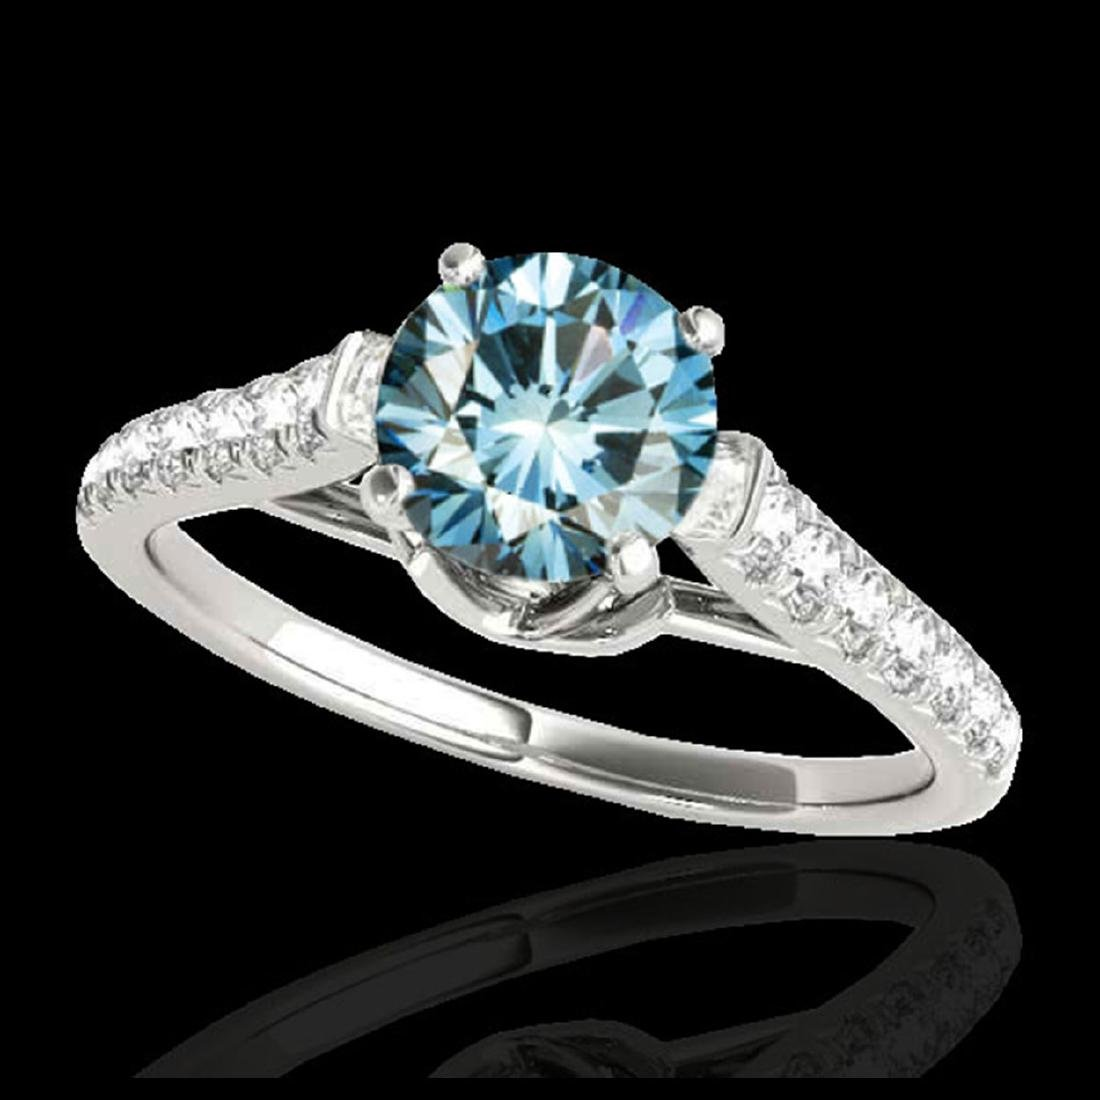 1.46 ctw SI Fancy Blue Diamond Solitaire Ring 10K White